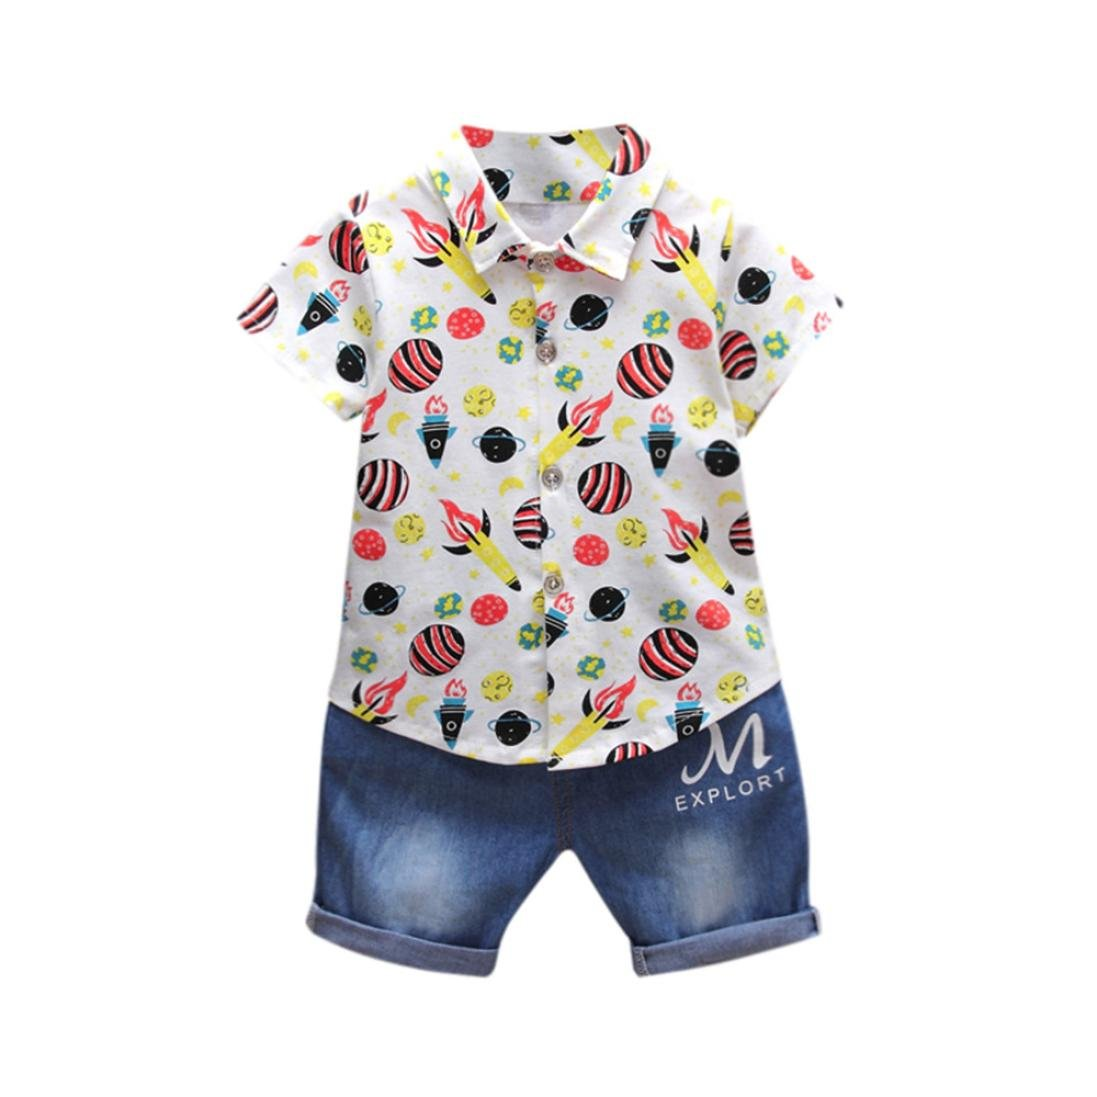 Lavany Baby Clothes Set Toddler Boy Rocket T-Shirt Tops Denim Pants Outfits